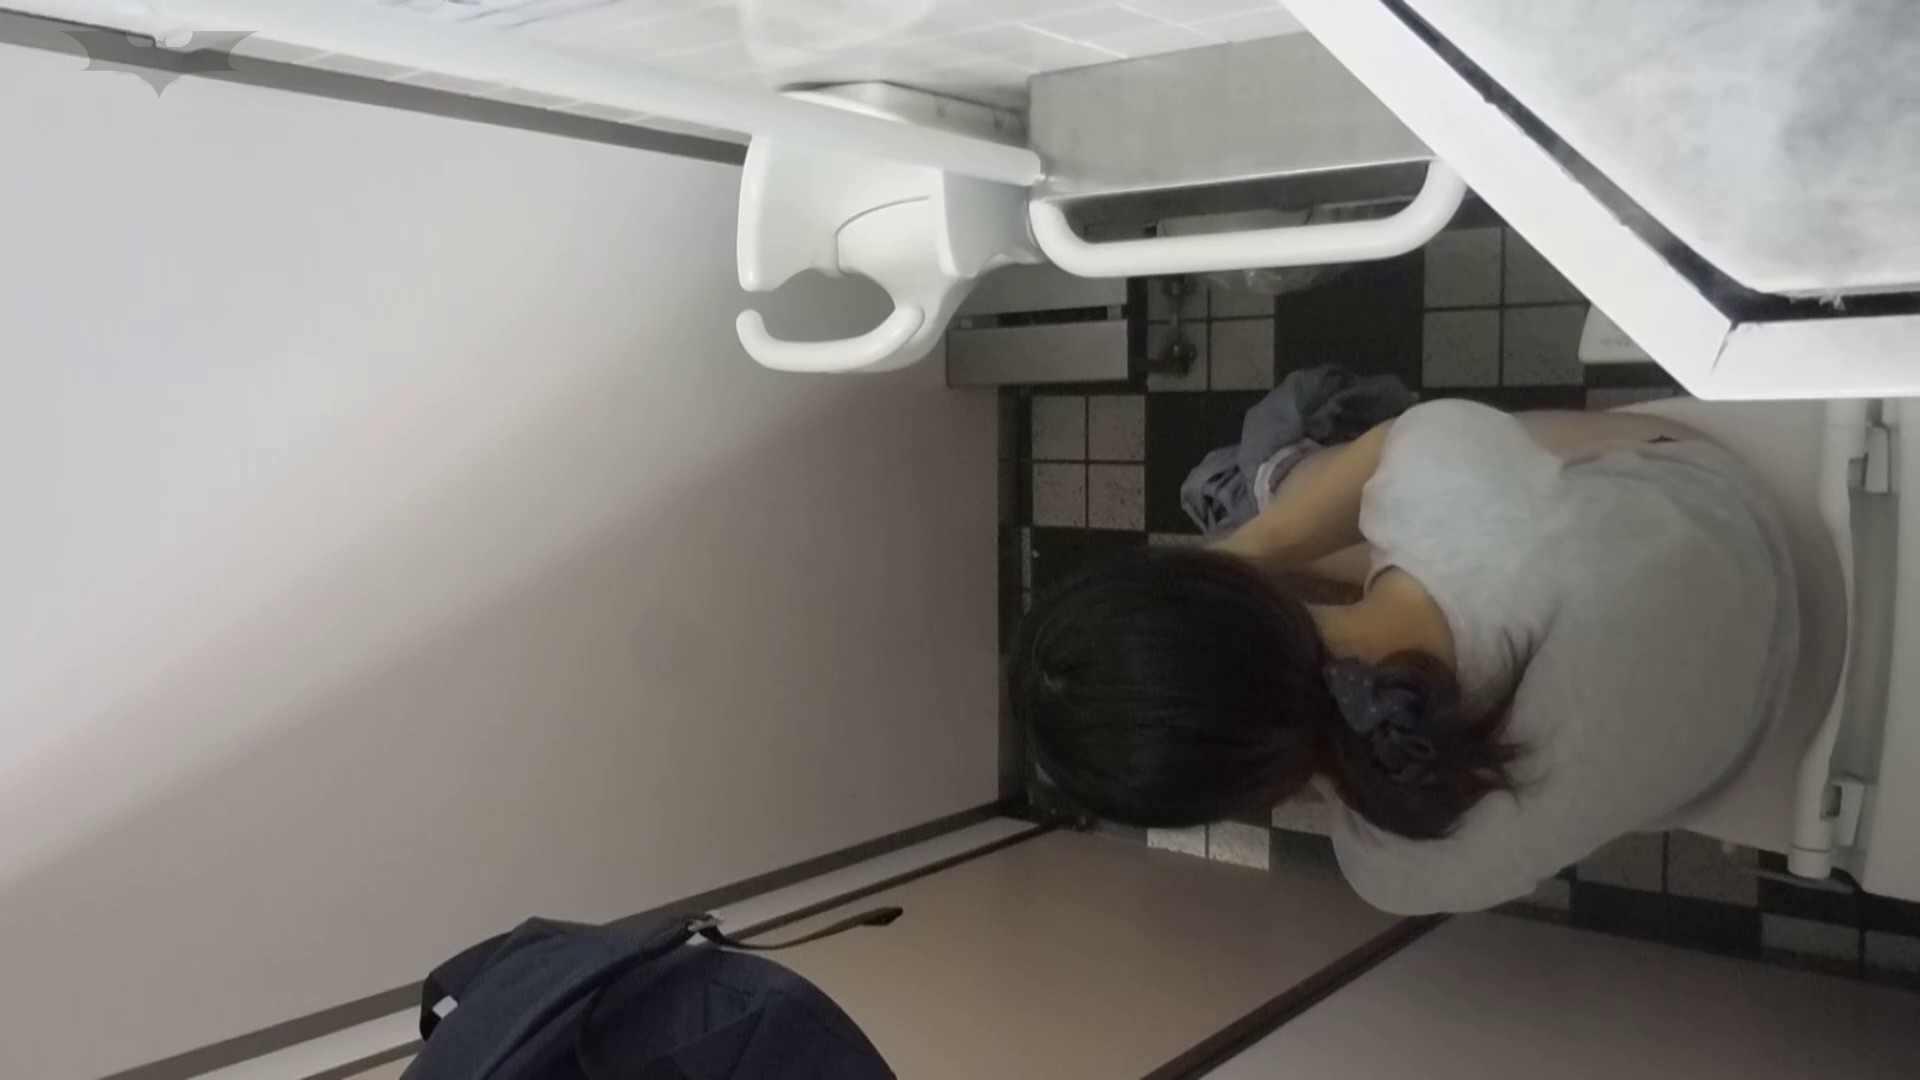 化粧室絵巻 駅舎編 VOL.20 今回は・・・ファッ!! 盛合せ  88PIX 72